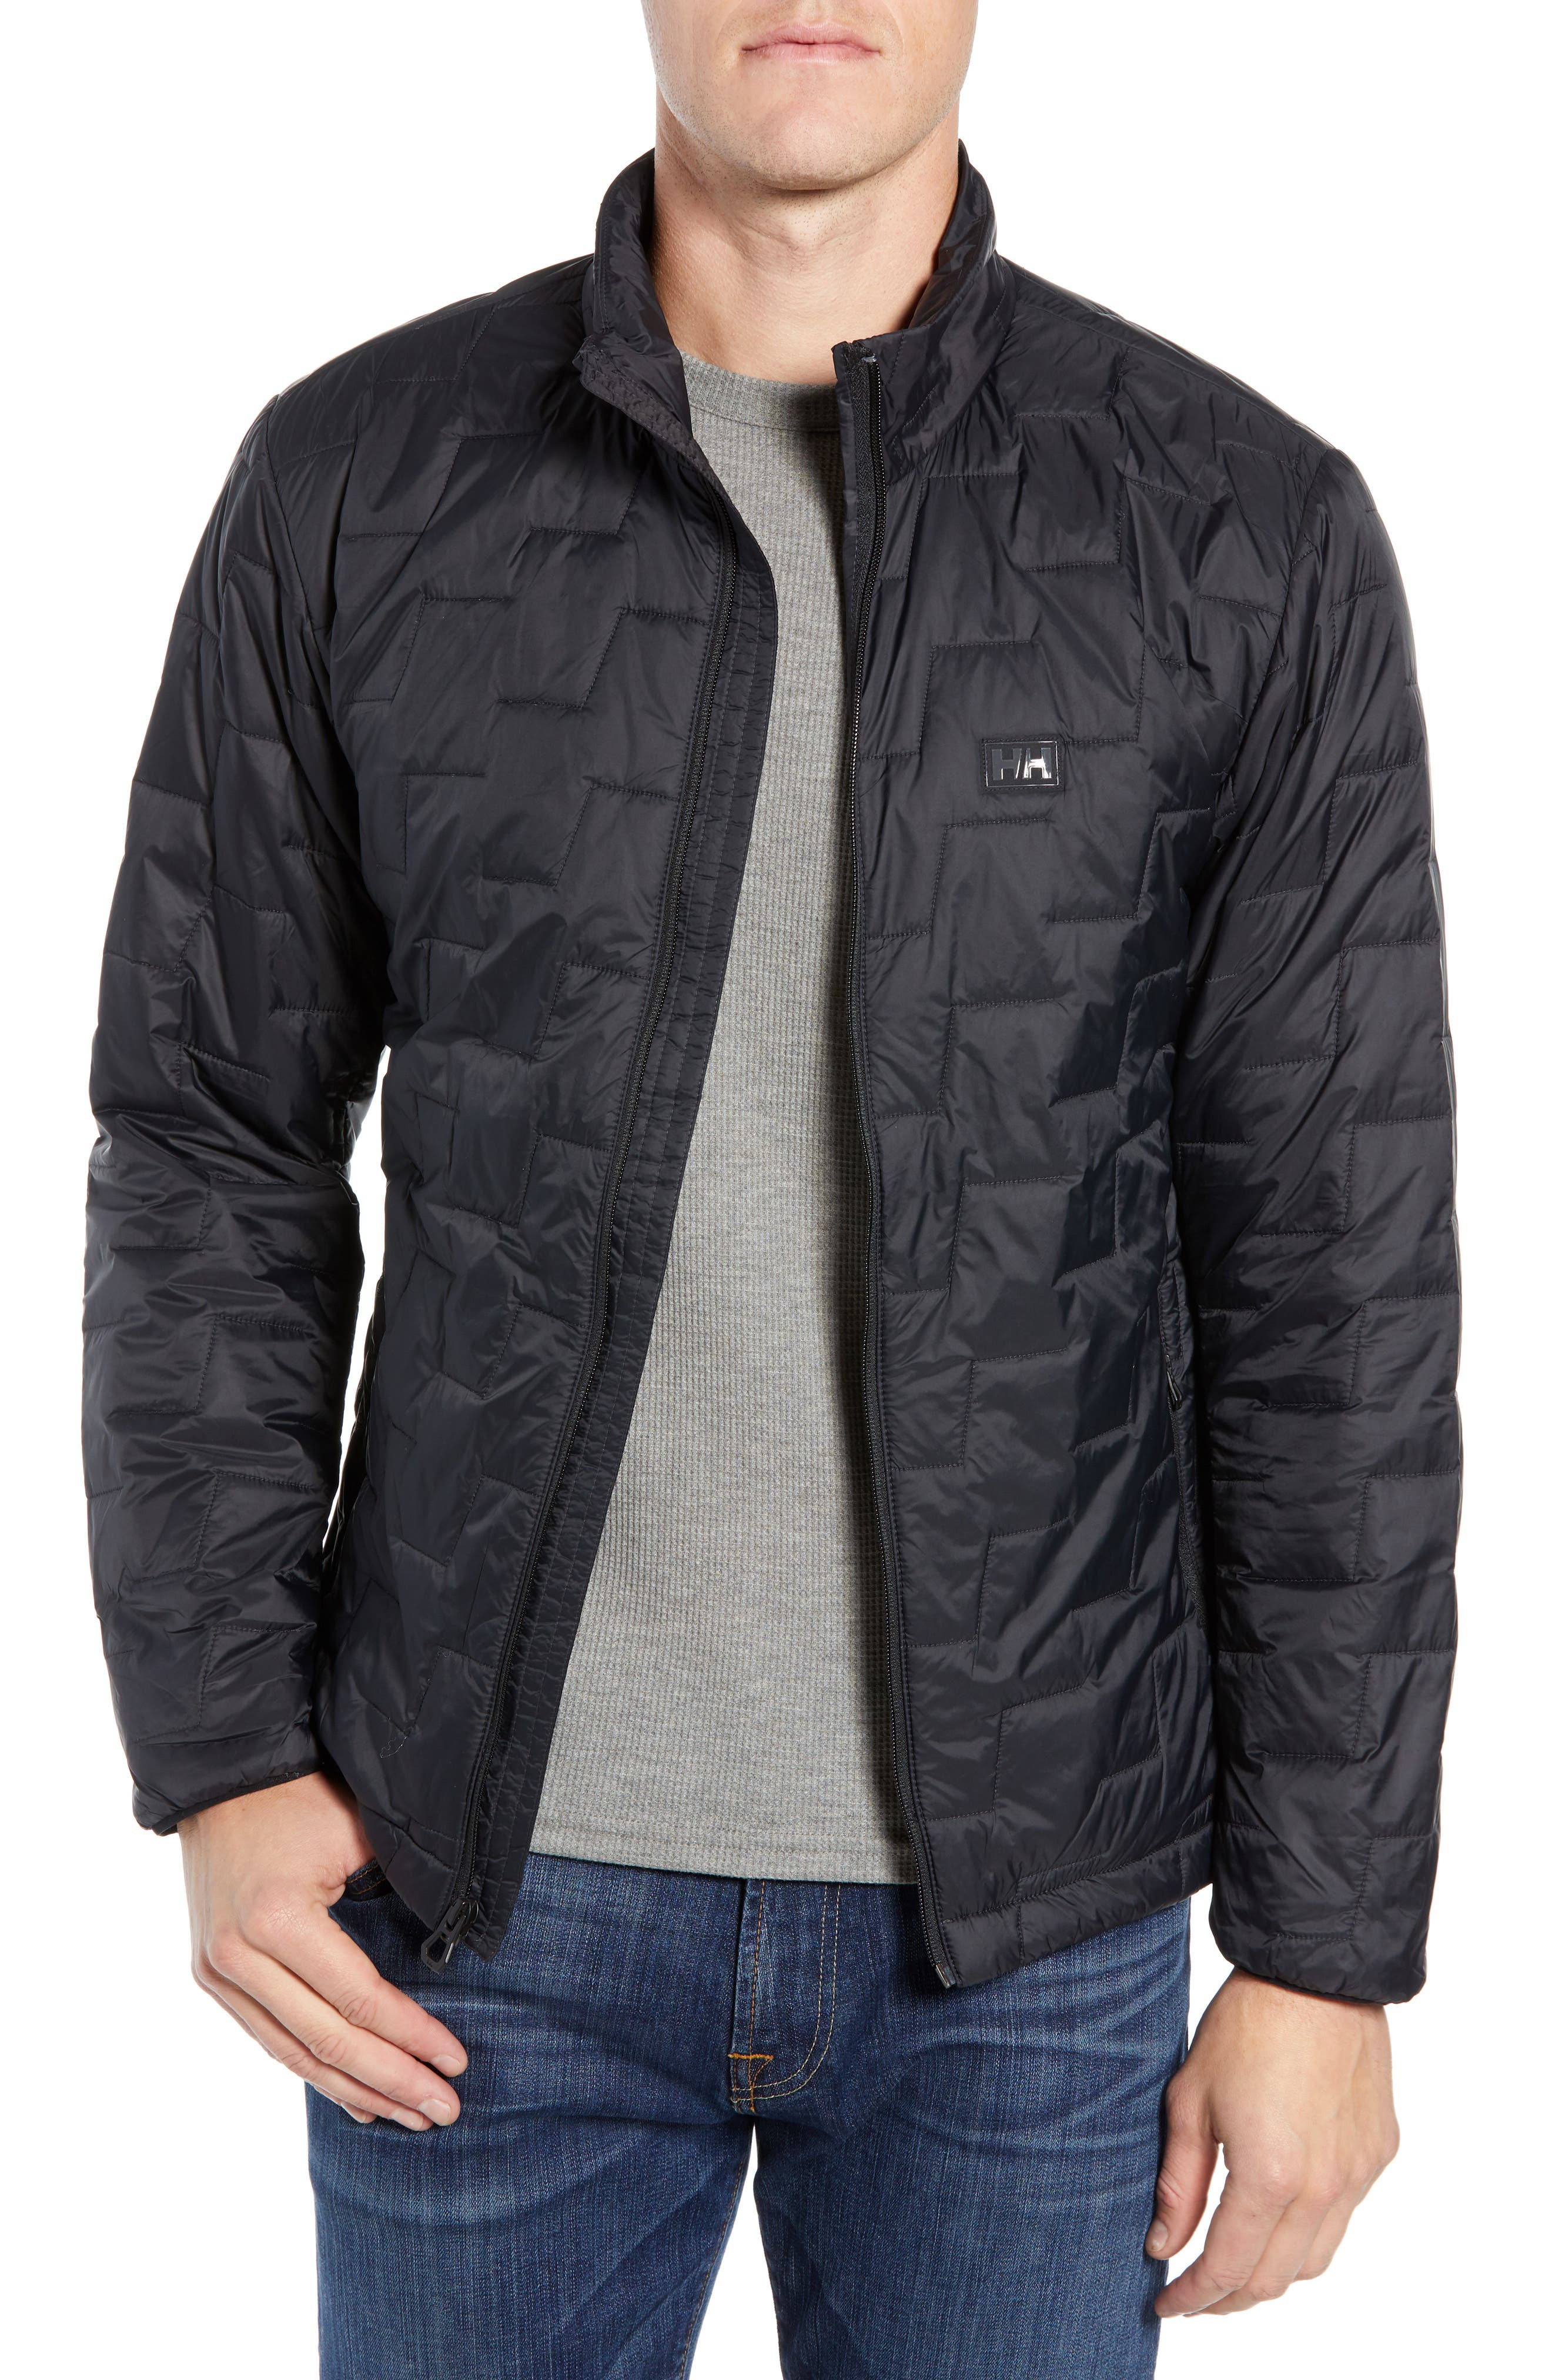 Helly Hansen Lifaloft Insulator Jacket, Black